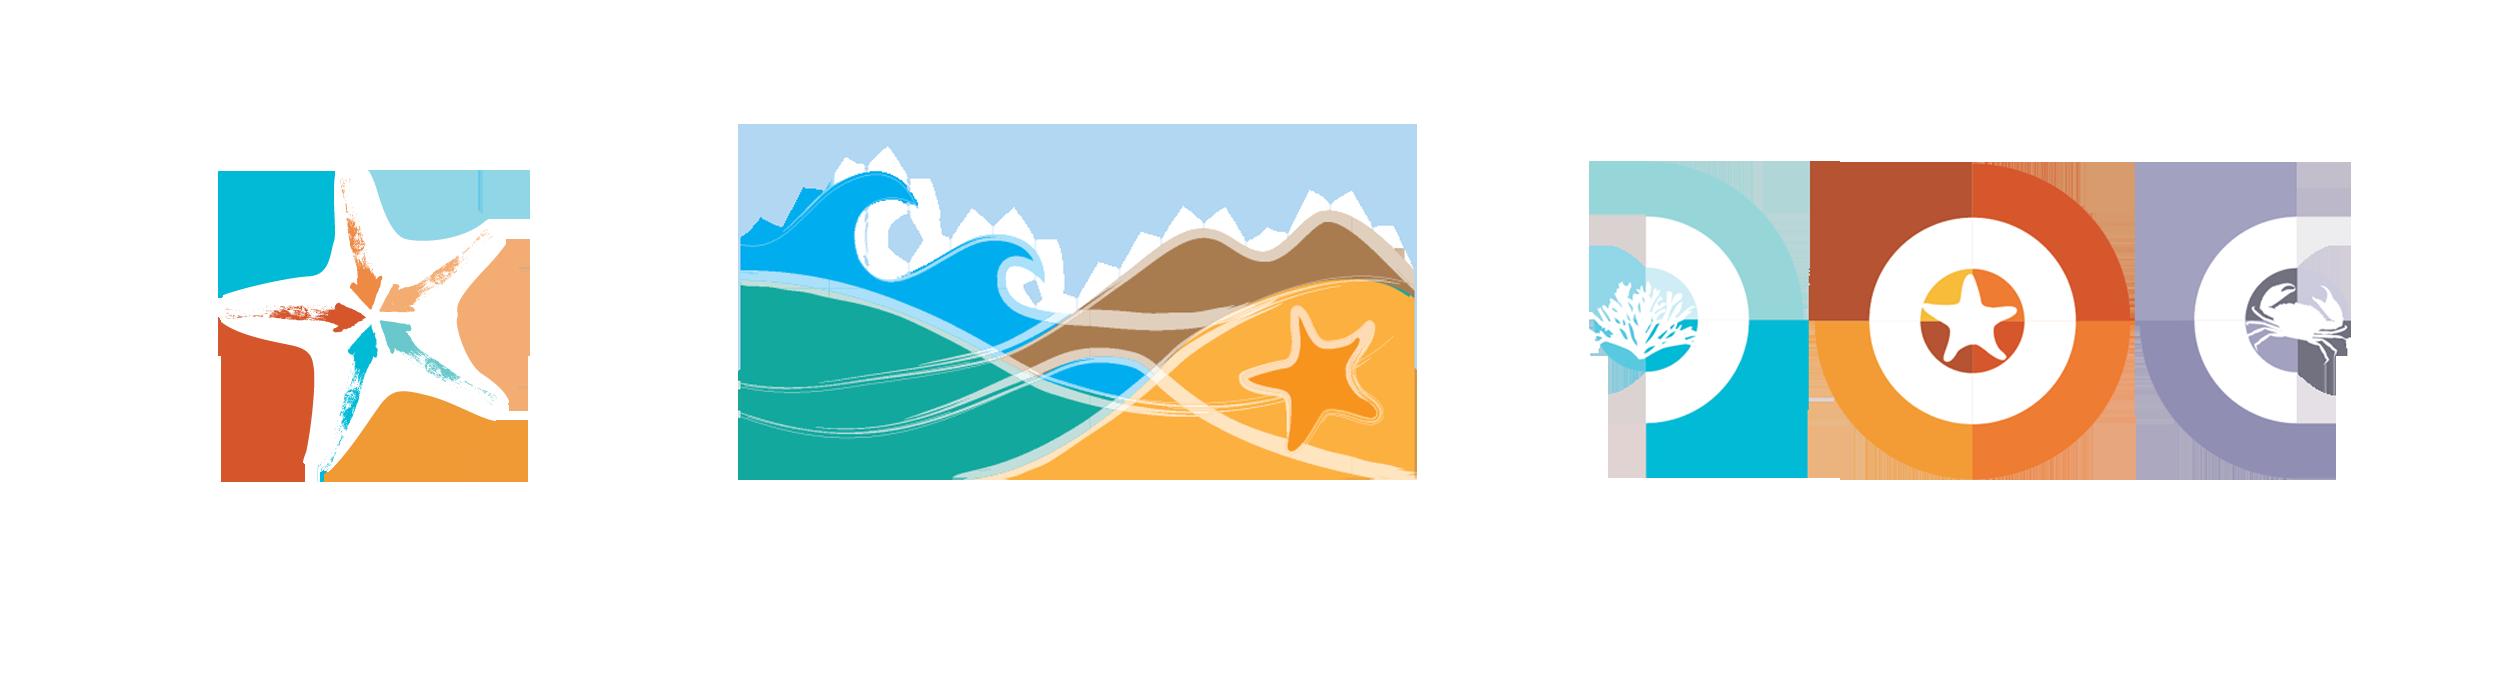 Capturing-Our-Coast-logo-proposalal2l